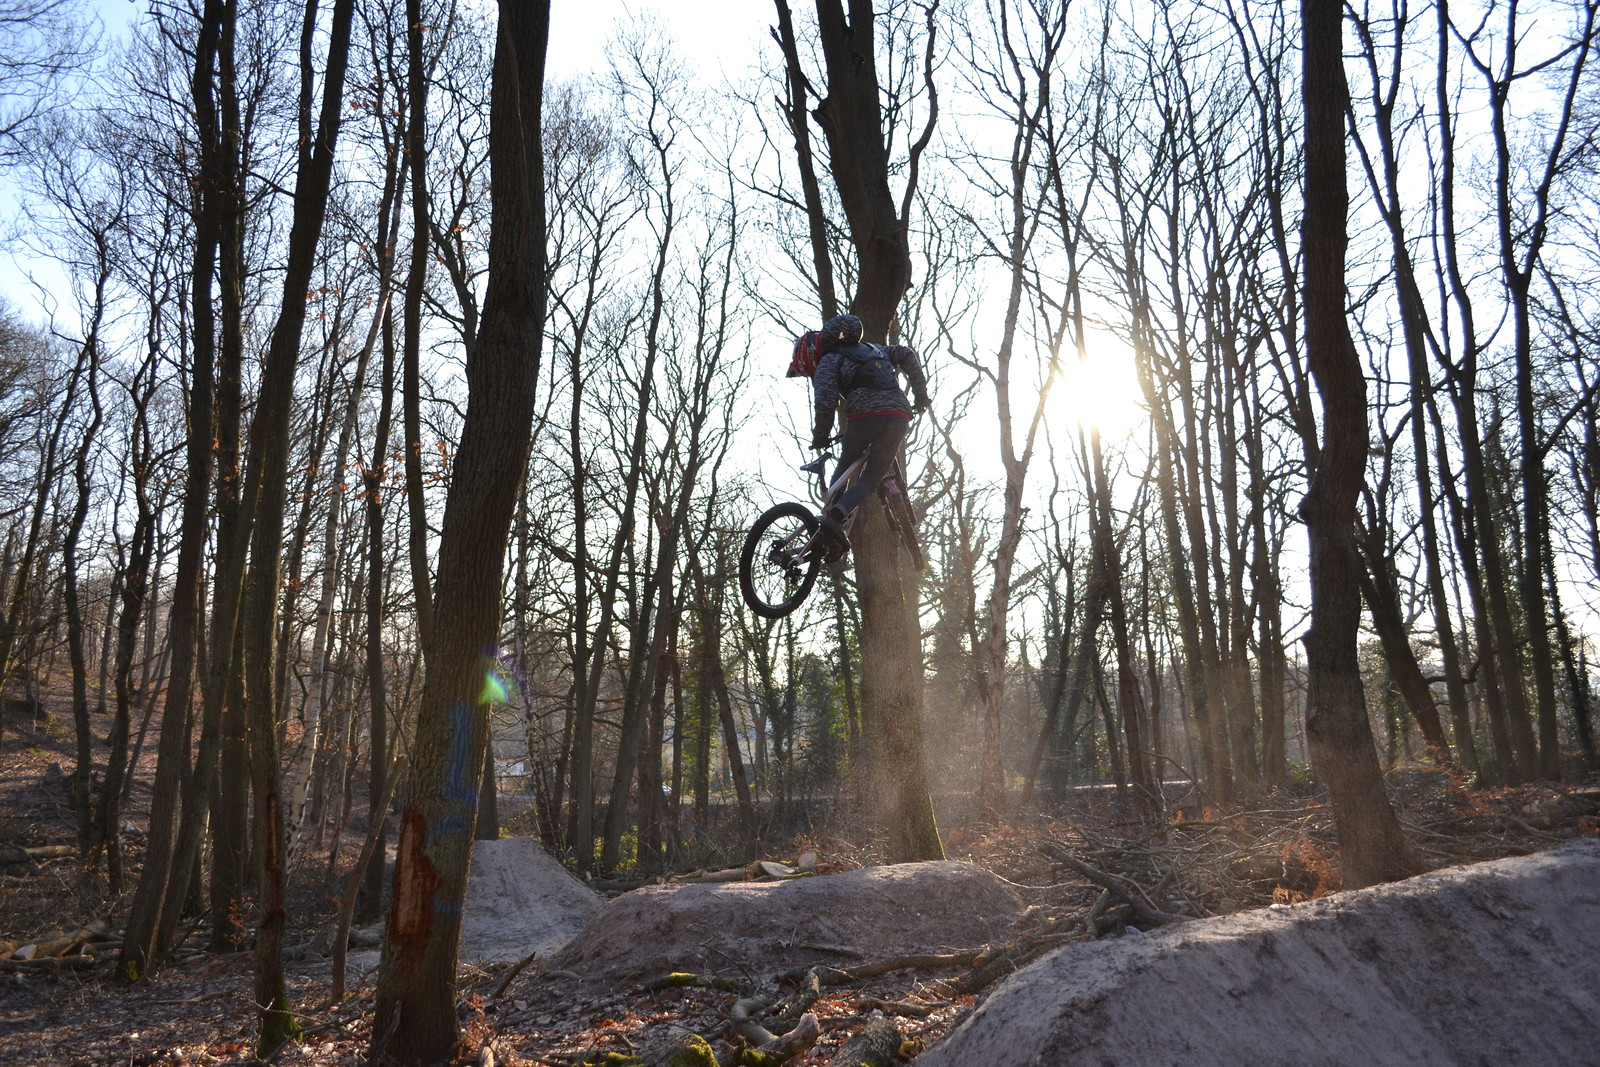 Whip it  - Romuald_Manach - Mountain Biking Pictures - Vital MTB